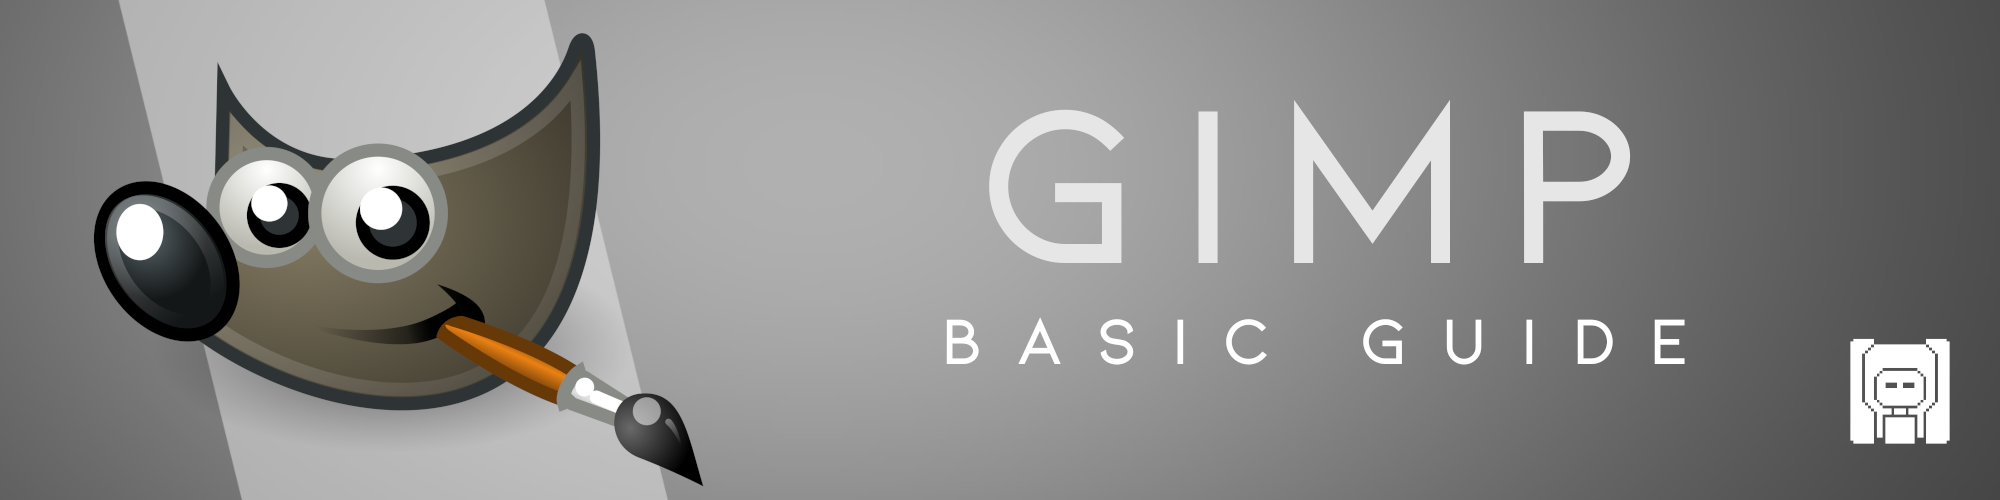 GIMP - Basic Guide (eBook)